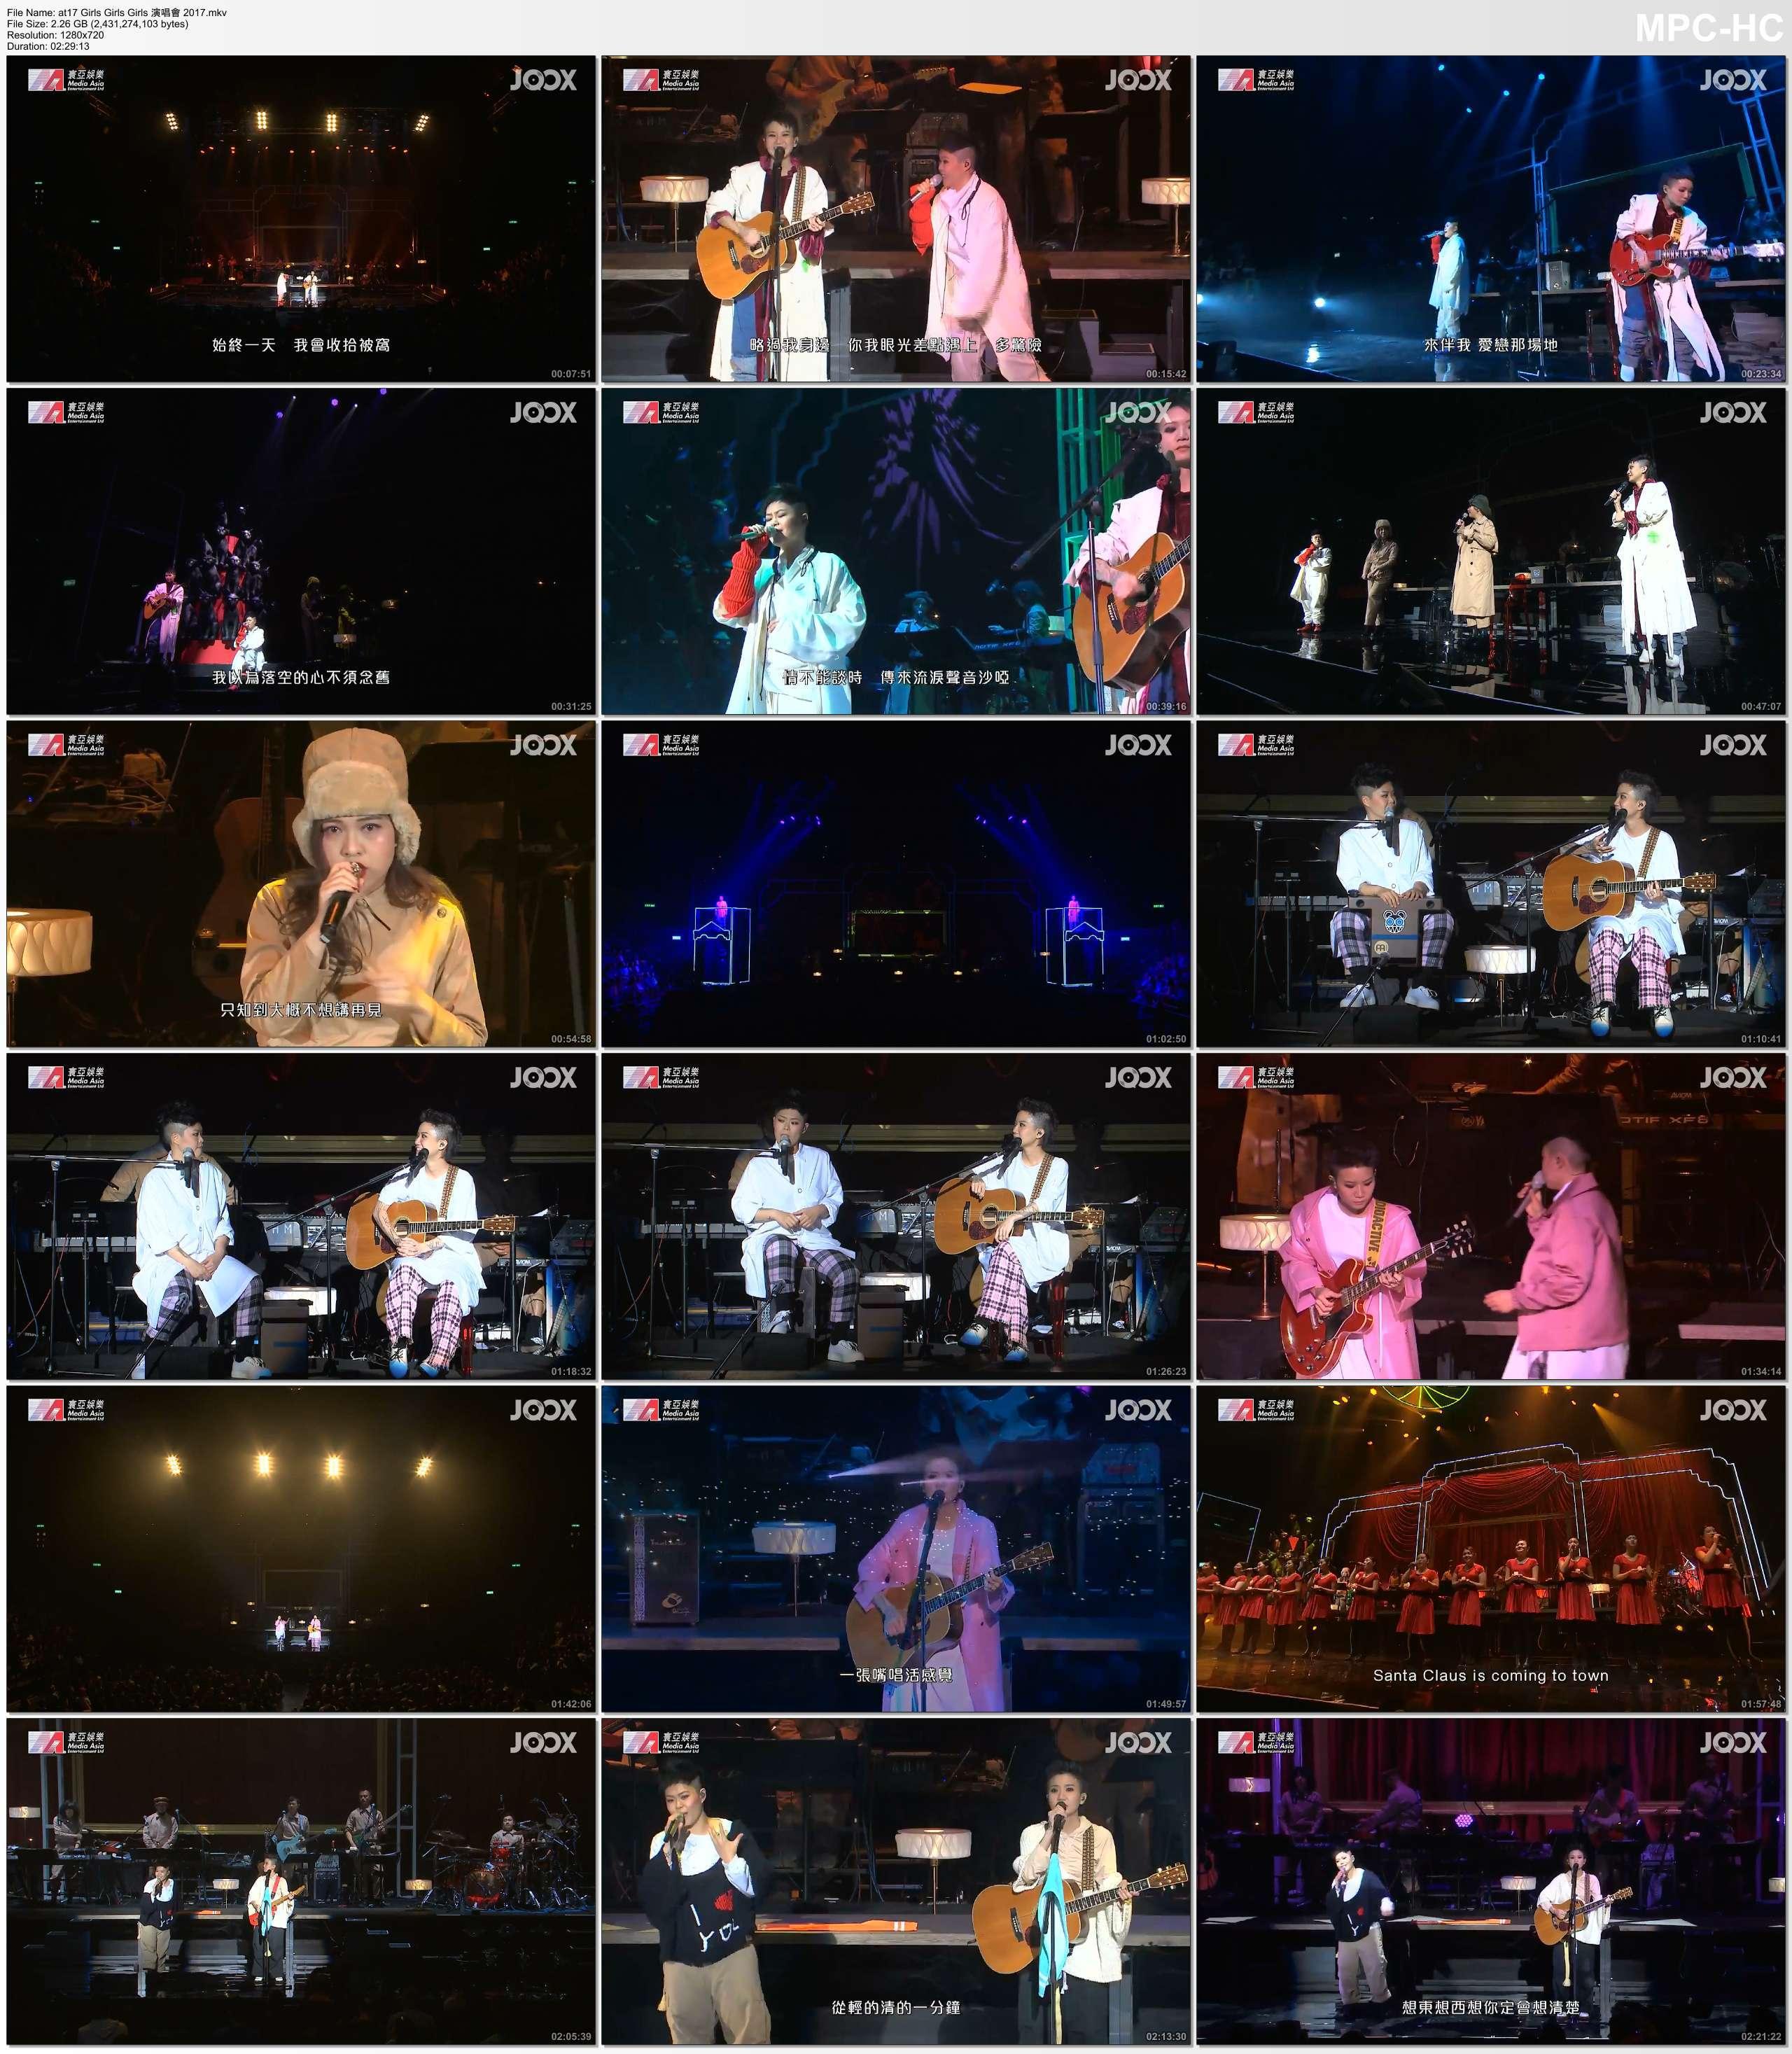 這邊是2017 at17 'Girls Girls Girls'演唱會 Live in Concert [HDTV-MKV/粵語/繁]圖片的自定義alt信息;544203,723463,dicksmell,40